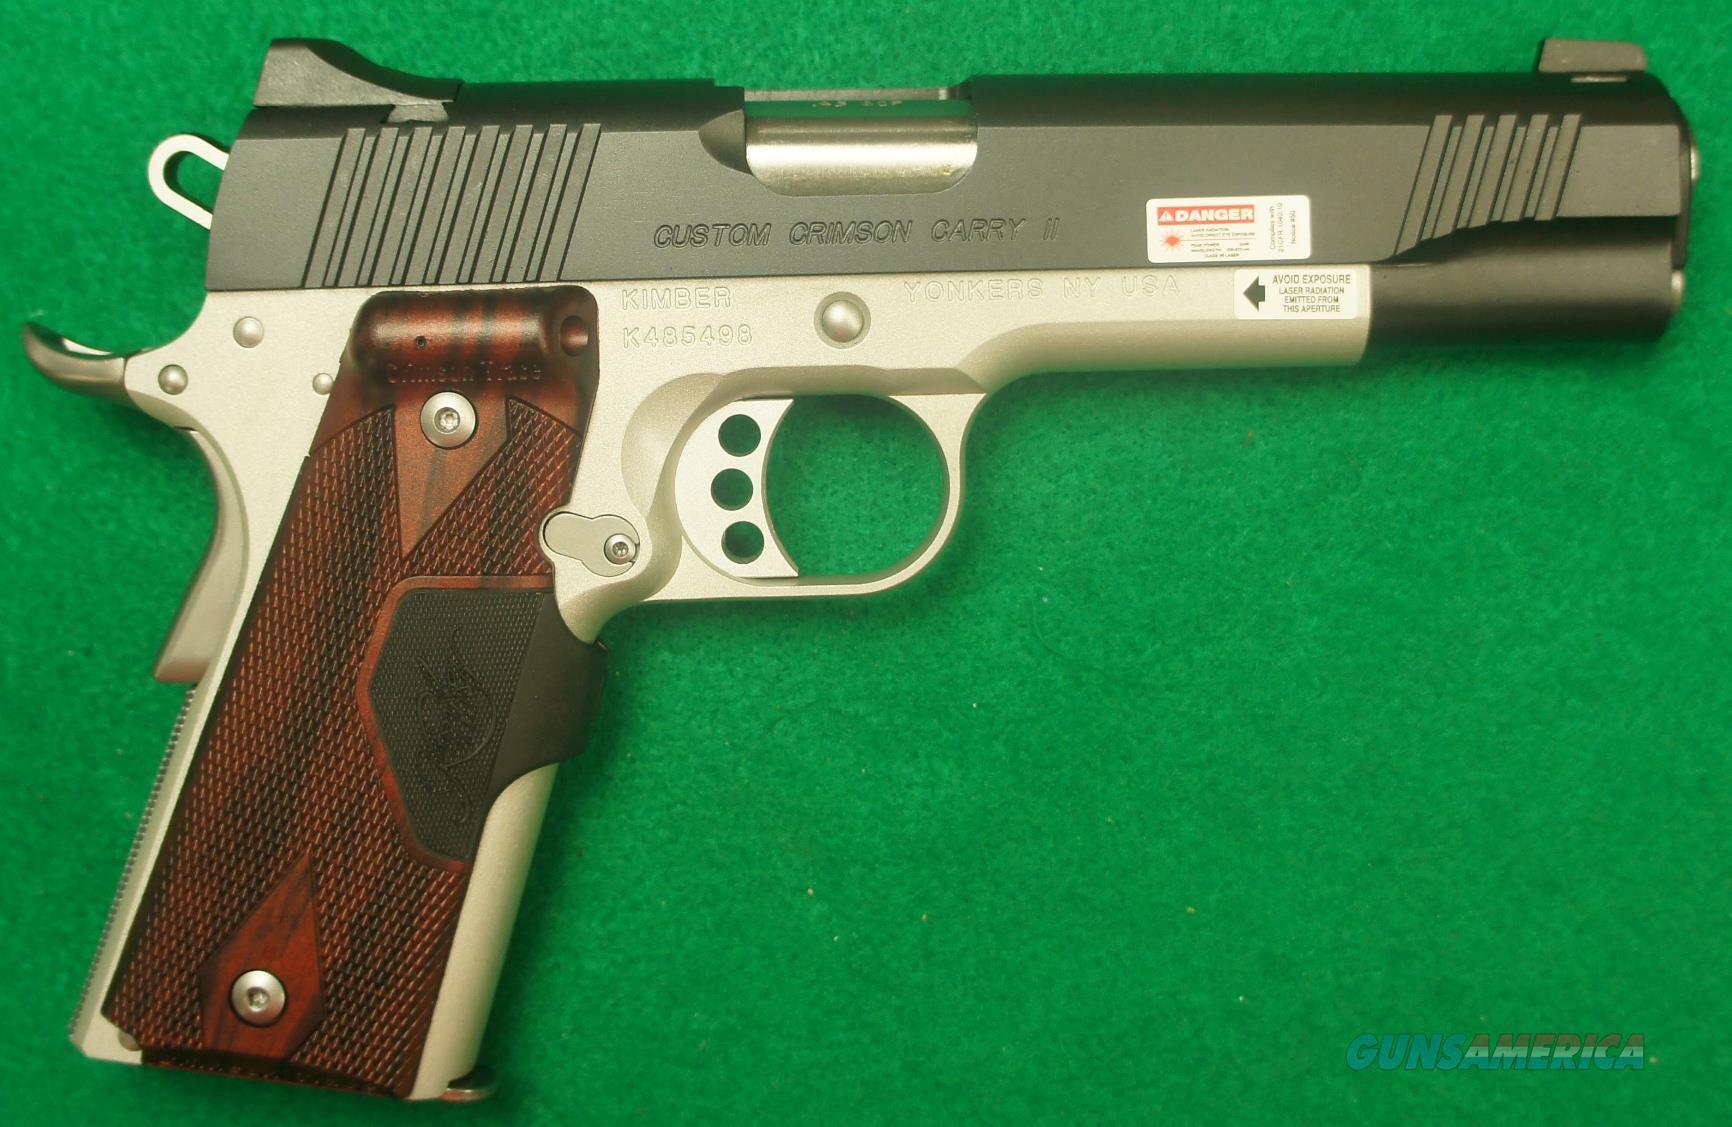 Custom Crimson Carry II 45ACP 5In  3000189  Guns